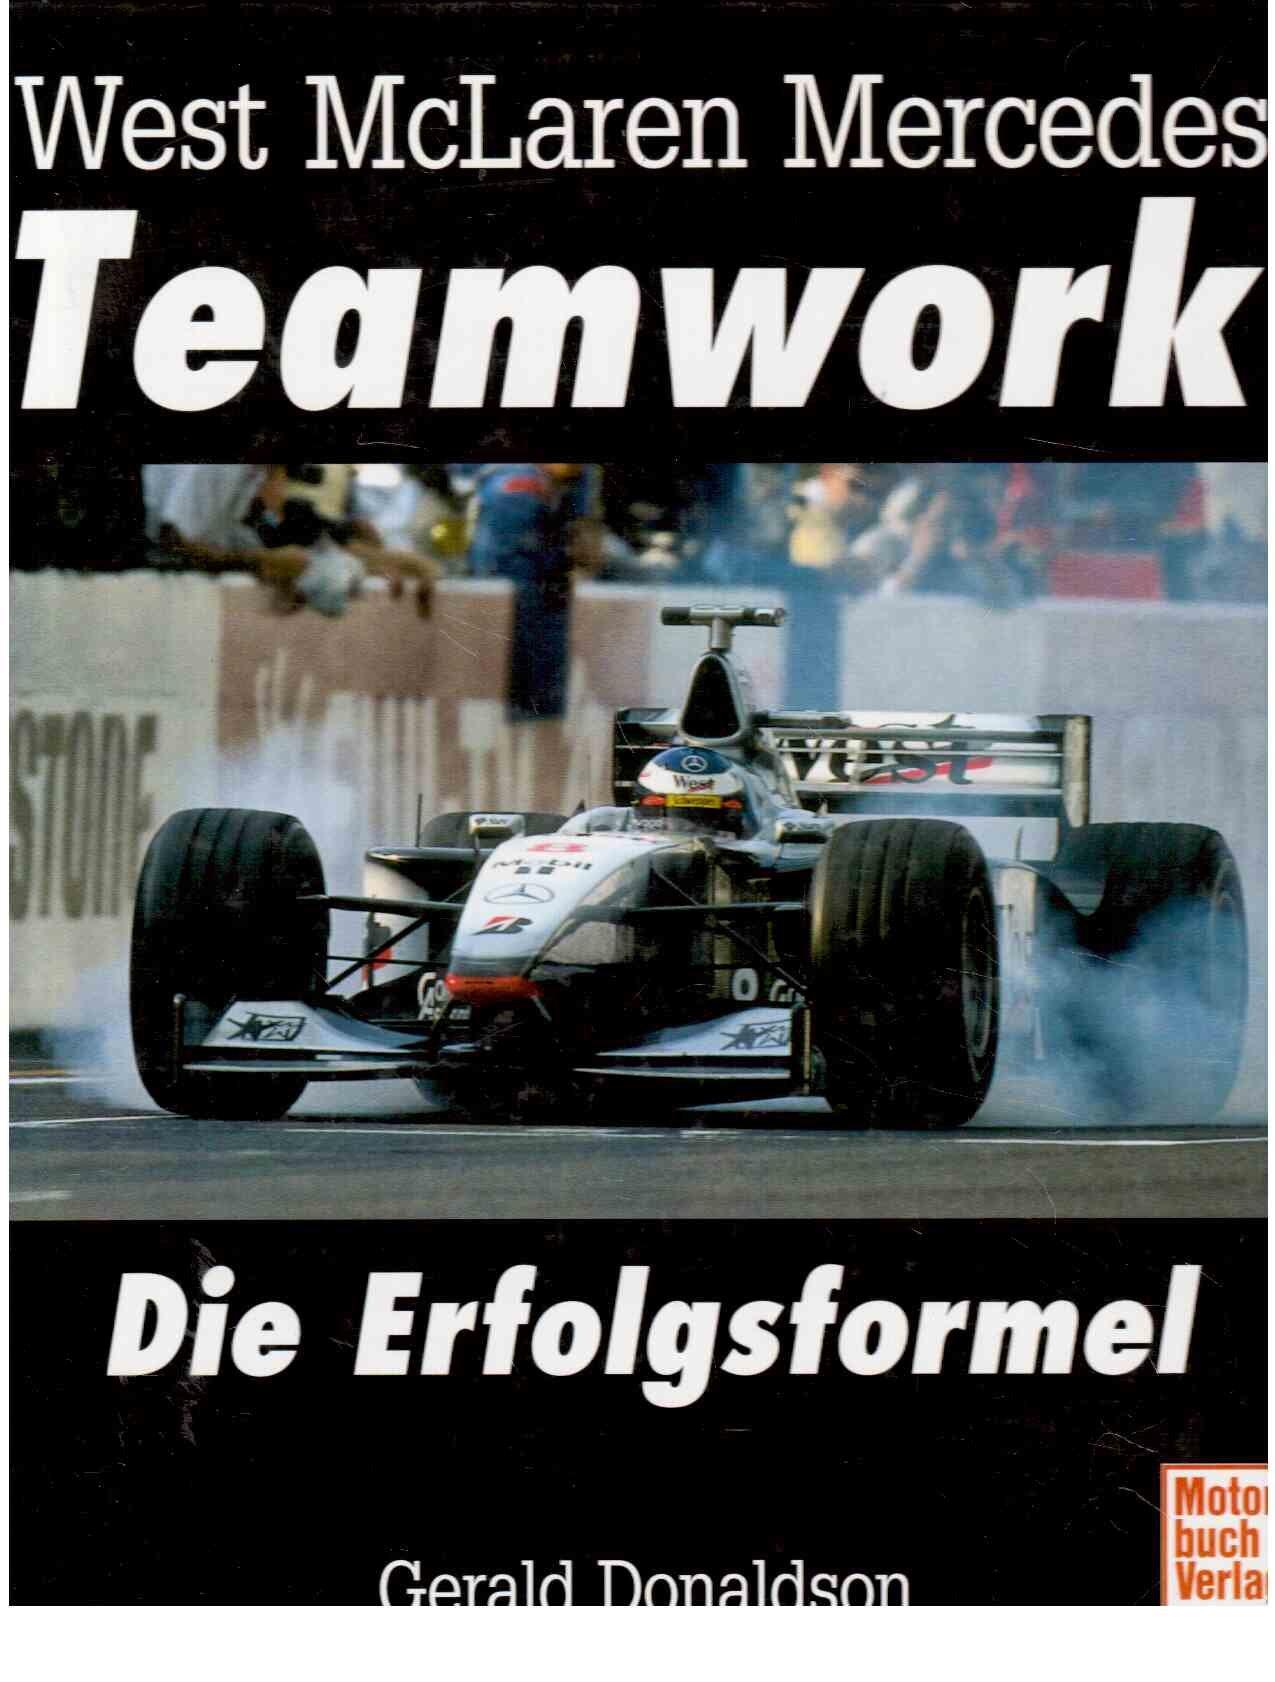 West McLaren Mercedes, Teamwork